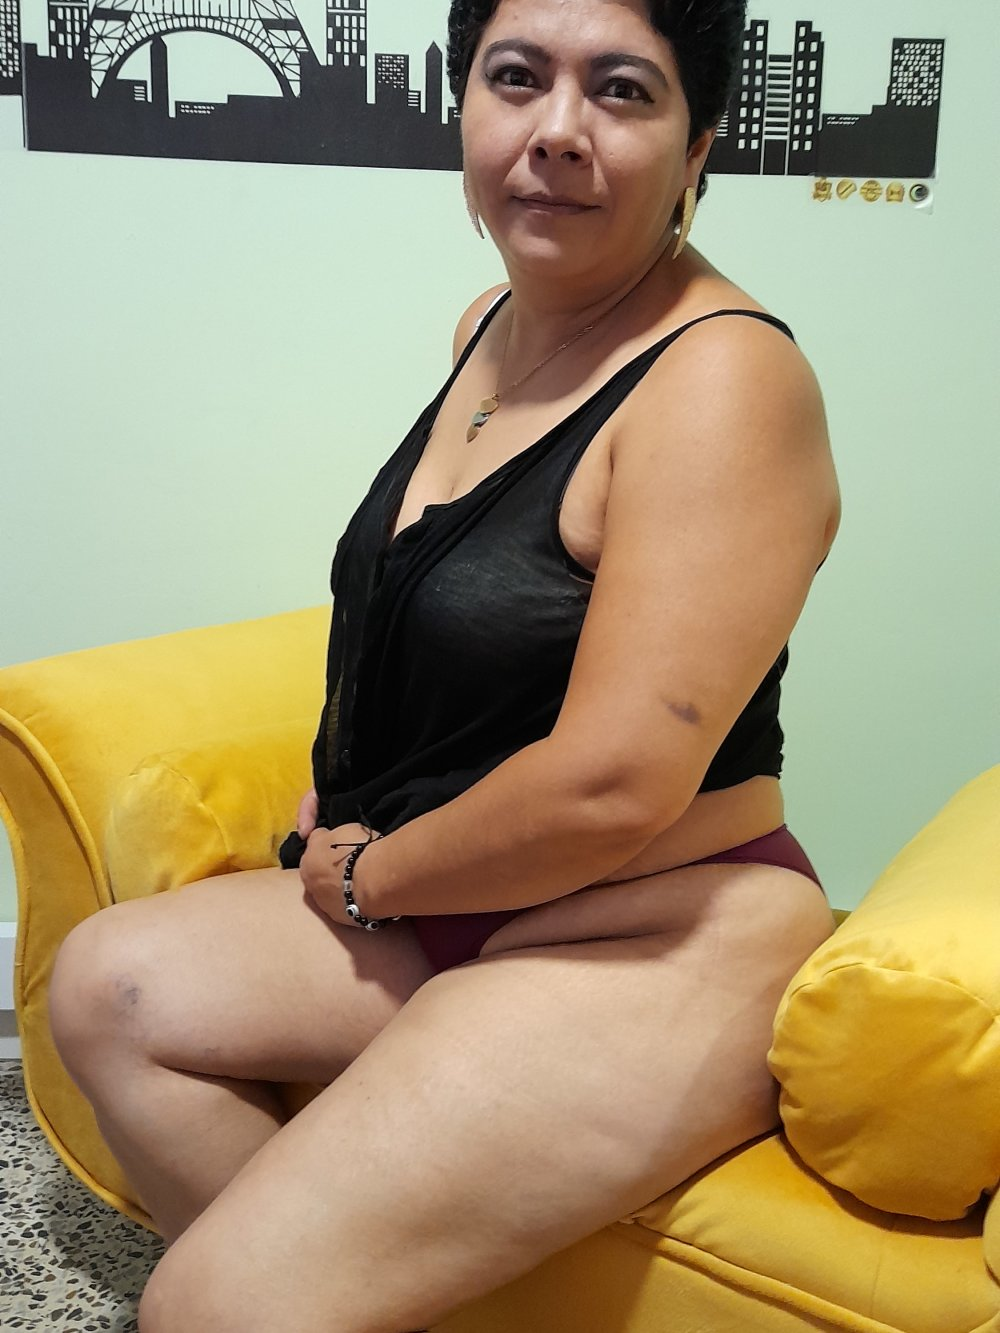 angellove266 at StripChat